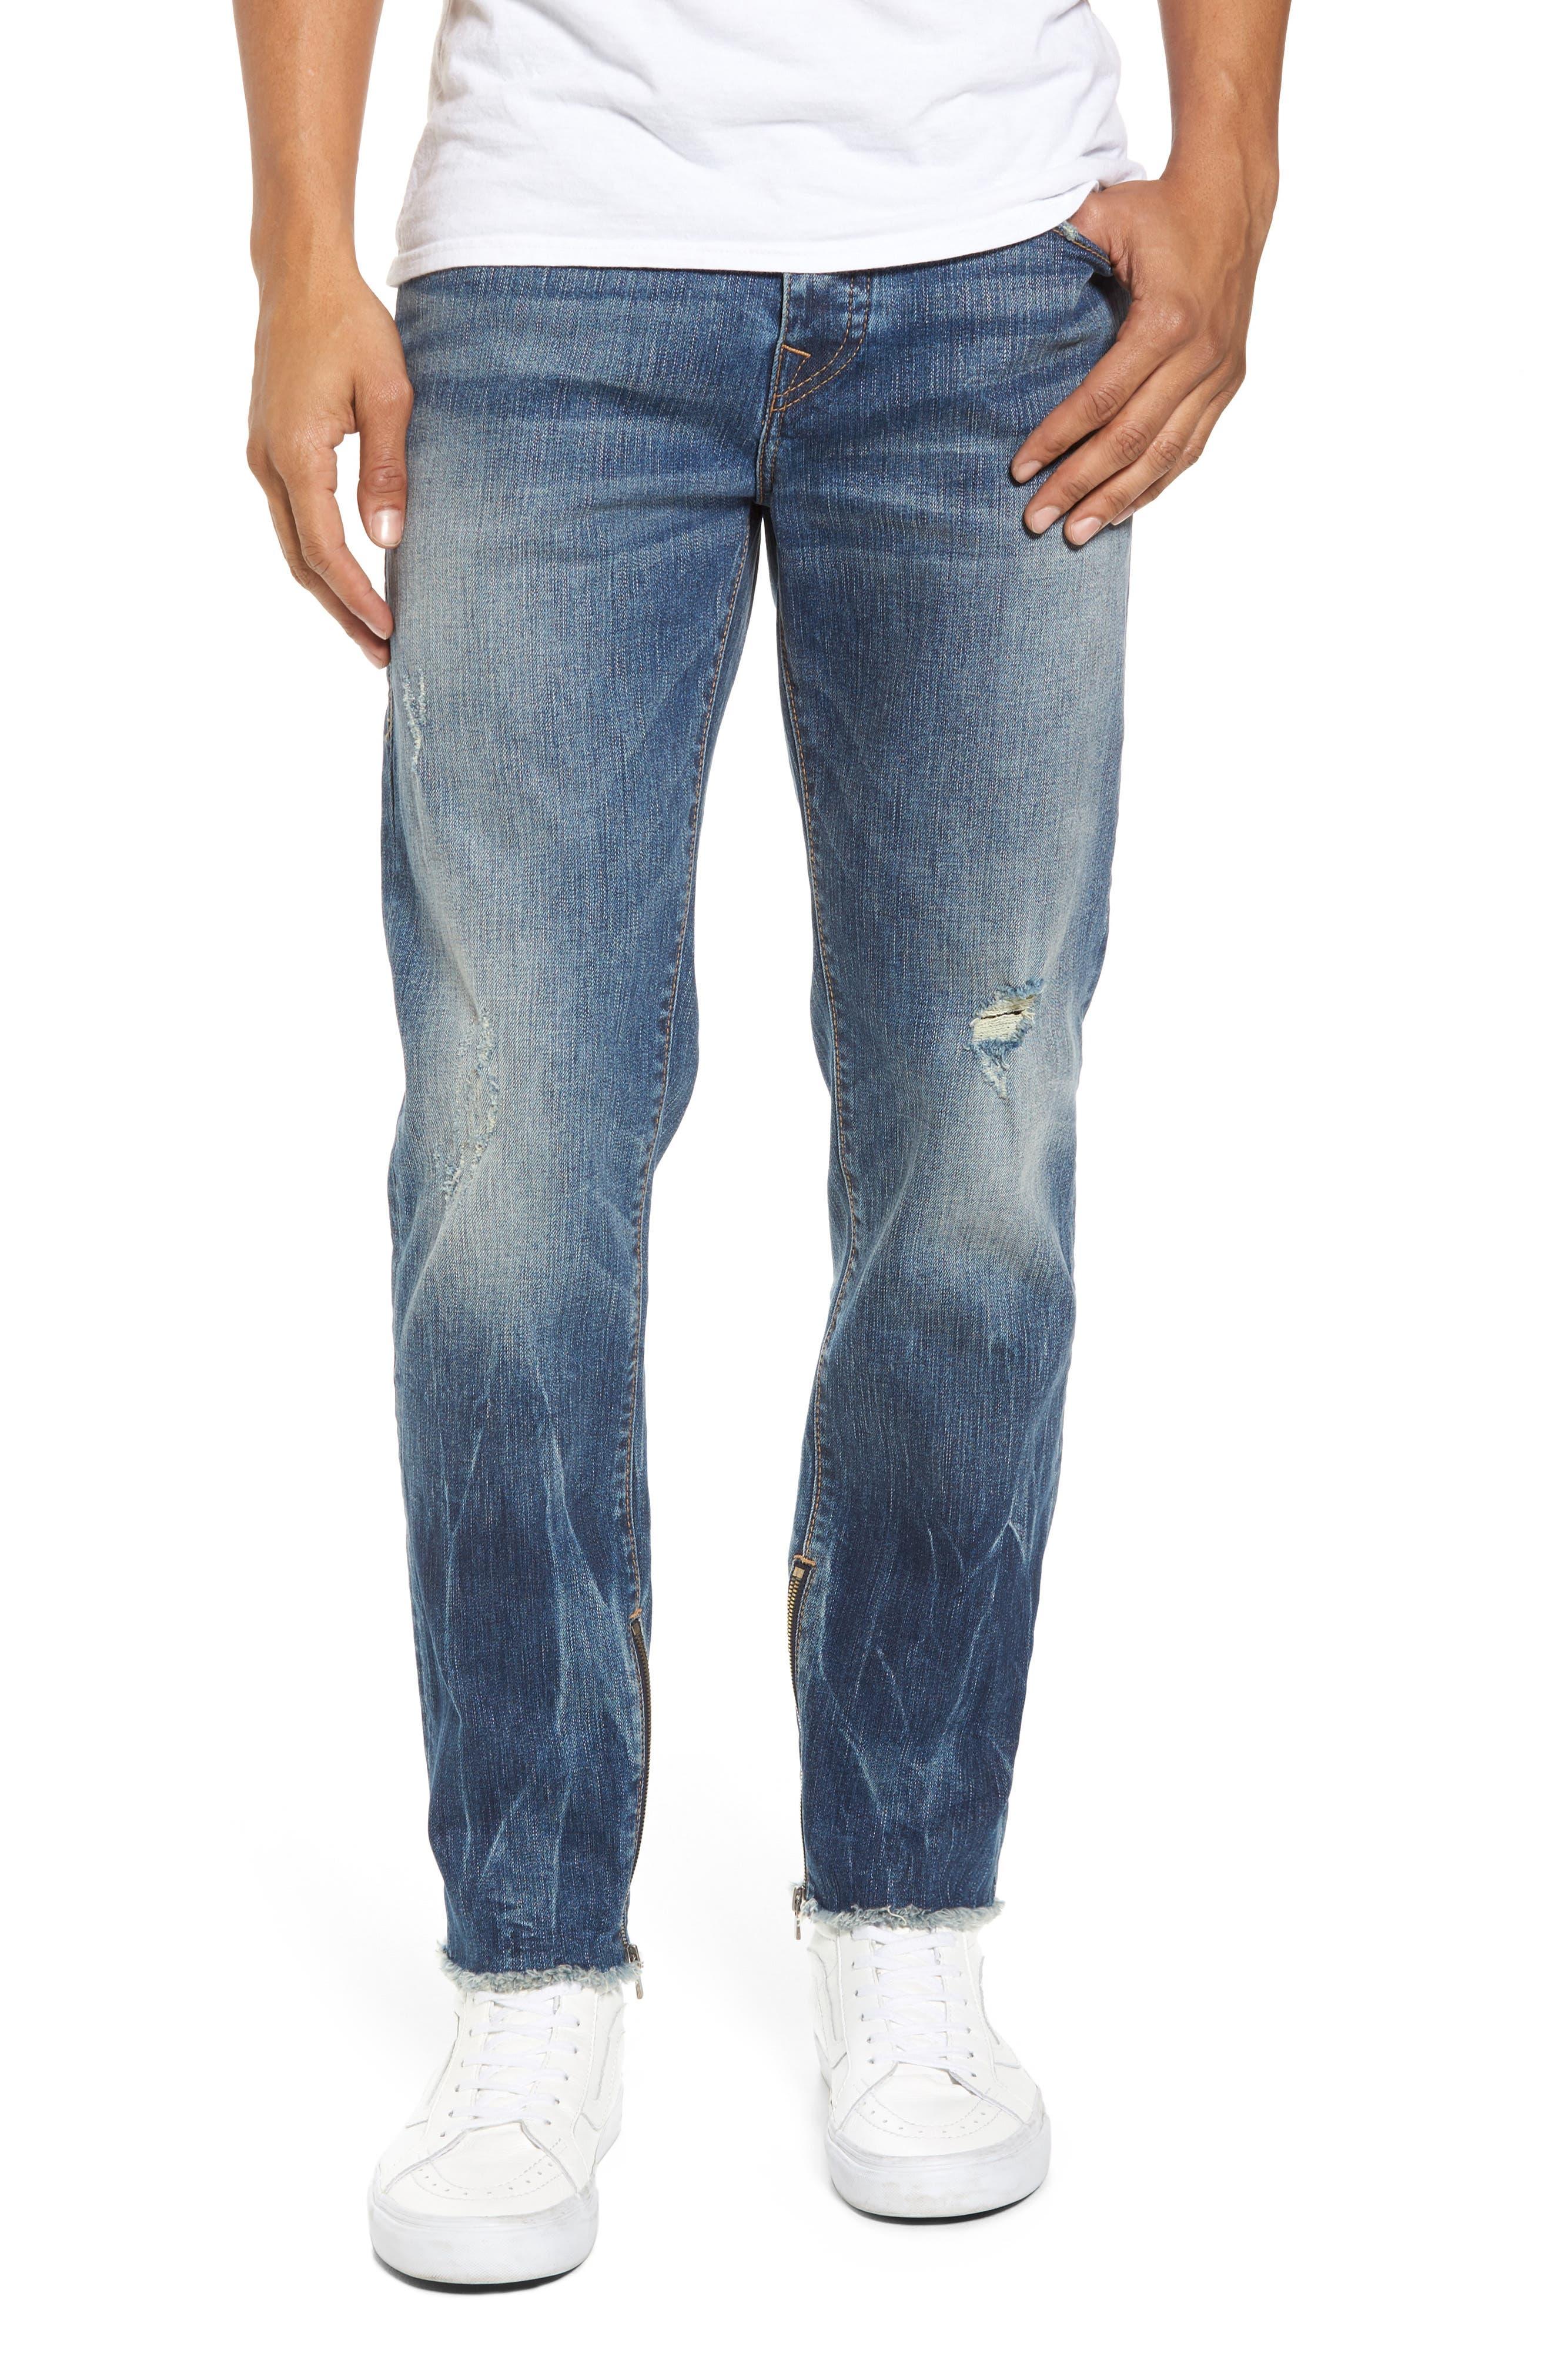 Main Image - True Religion Brand Jeans Finn Frayed Skinny Fit Jeans (Envy)